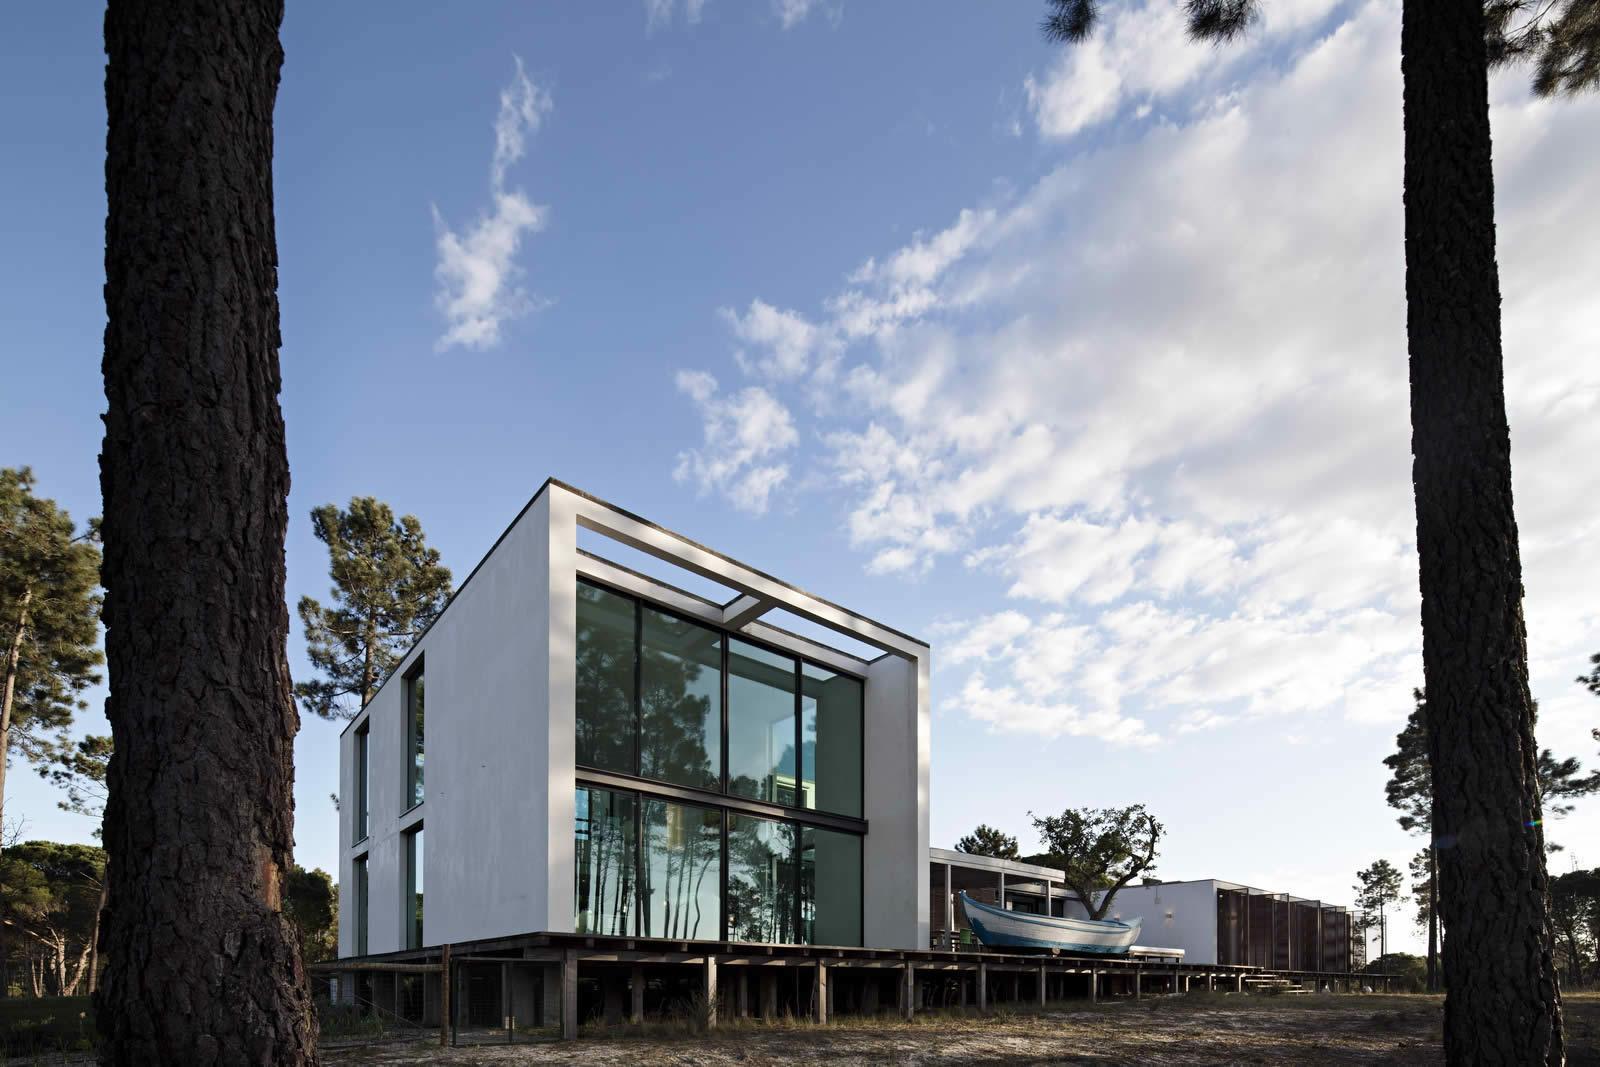 stunning villa moderne a vendre portugal ideas awesome interior home satellite. Black Bedroom Furniture Sets. Home Design Ideas